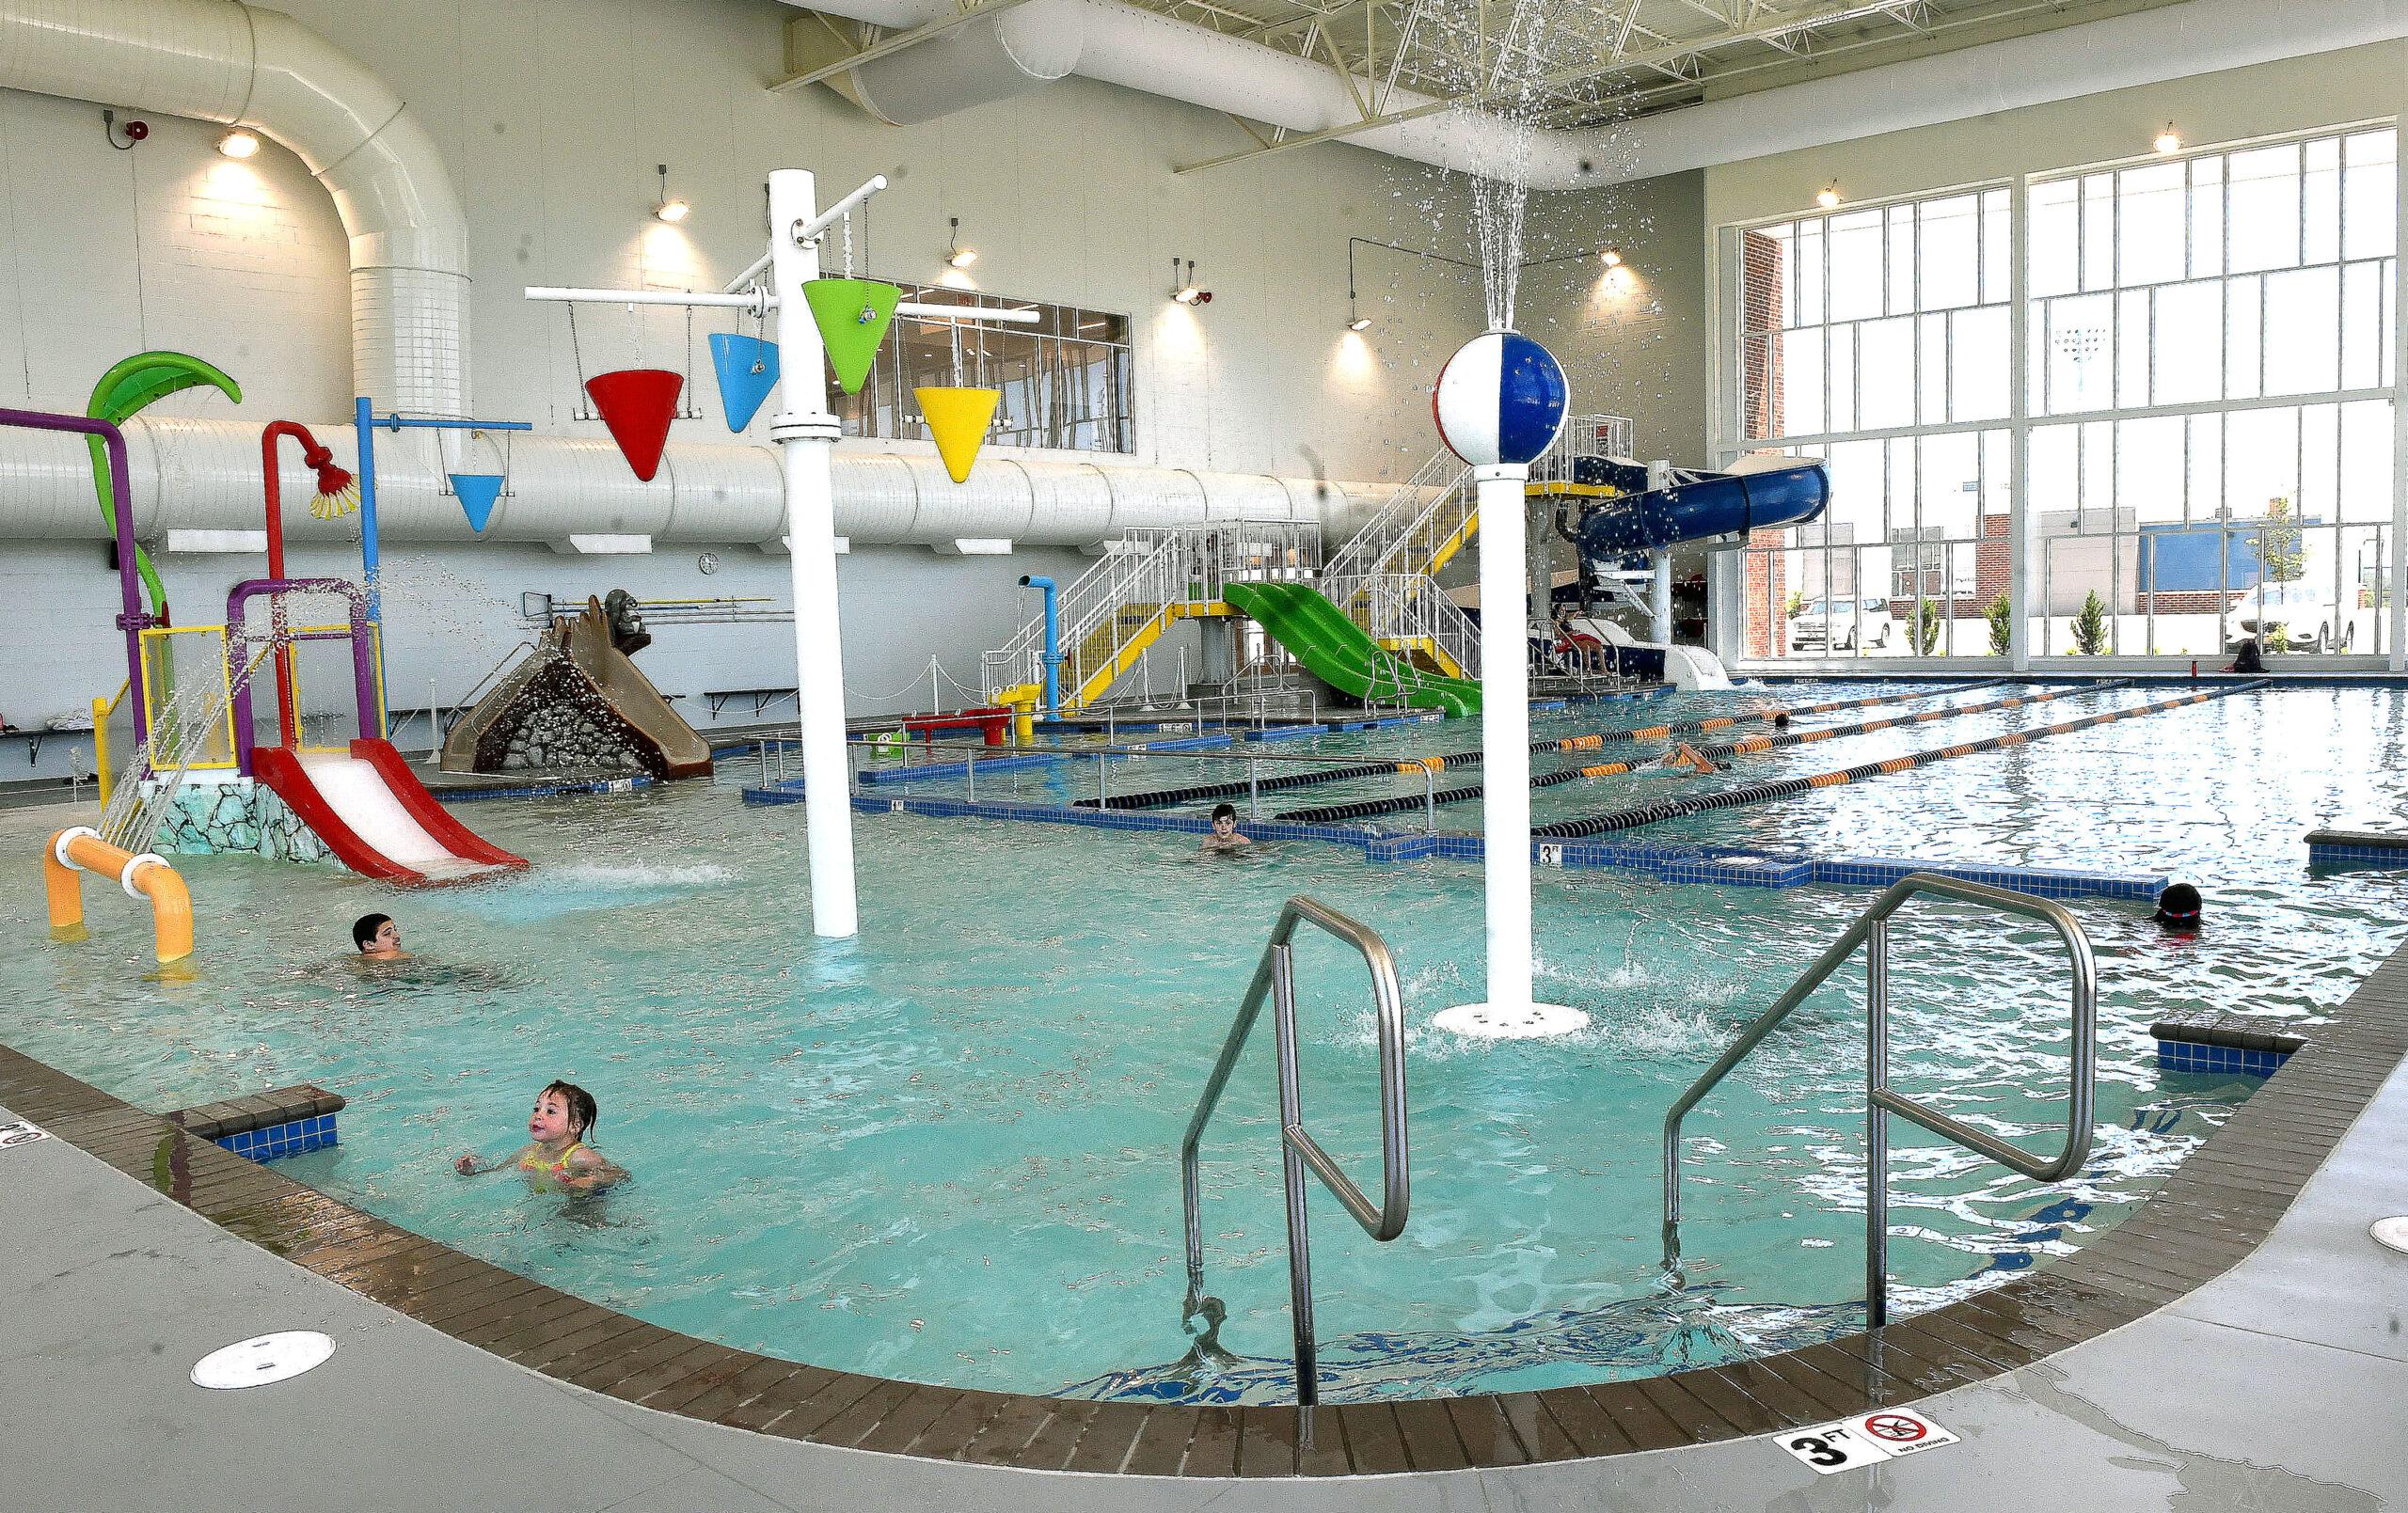 Mylan Aquatic reopens June 1, 2020